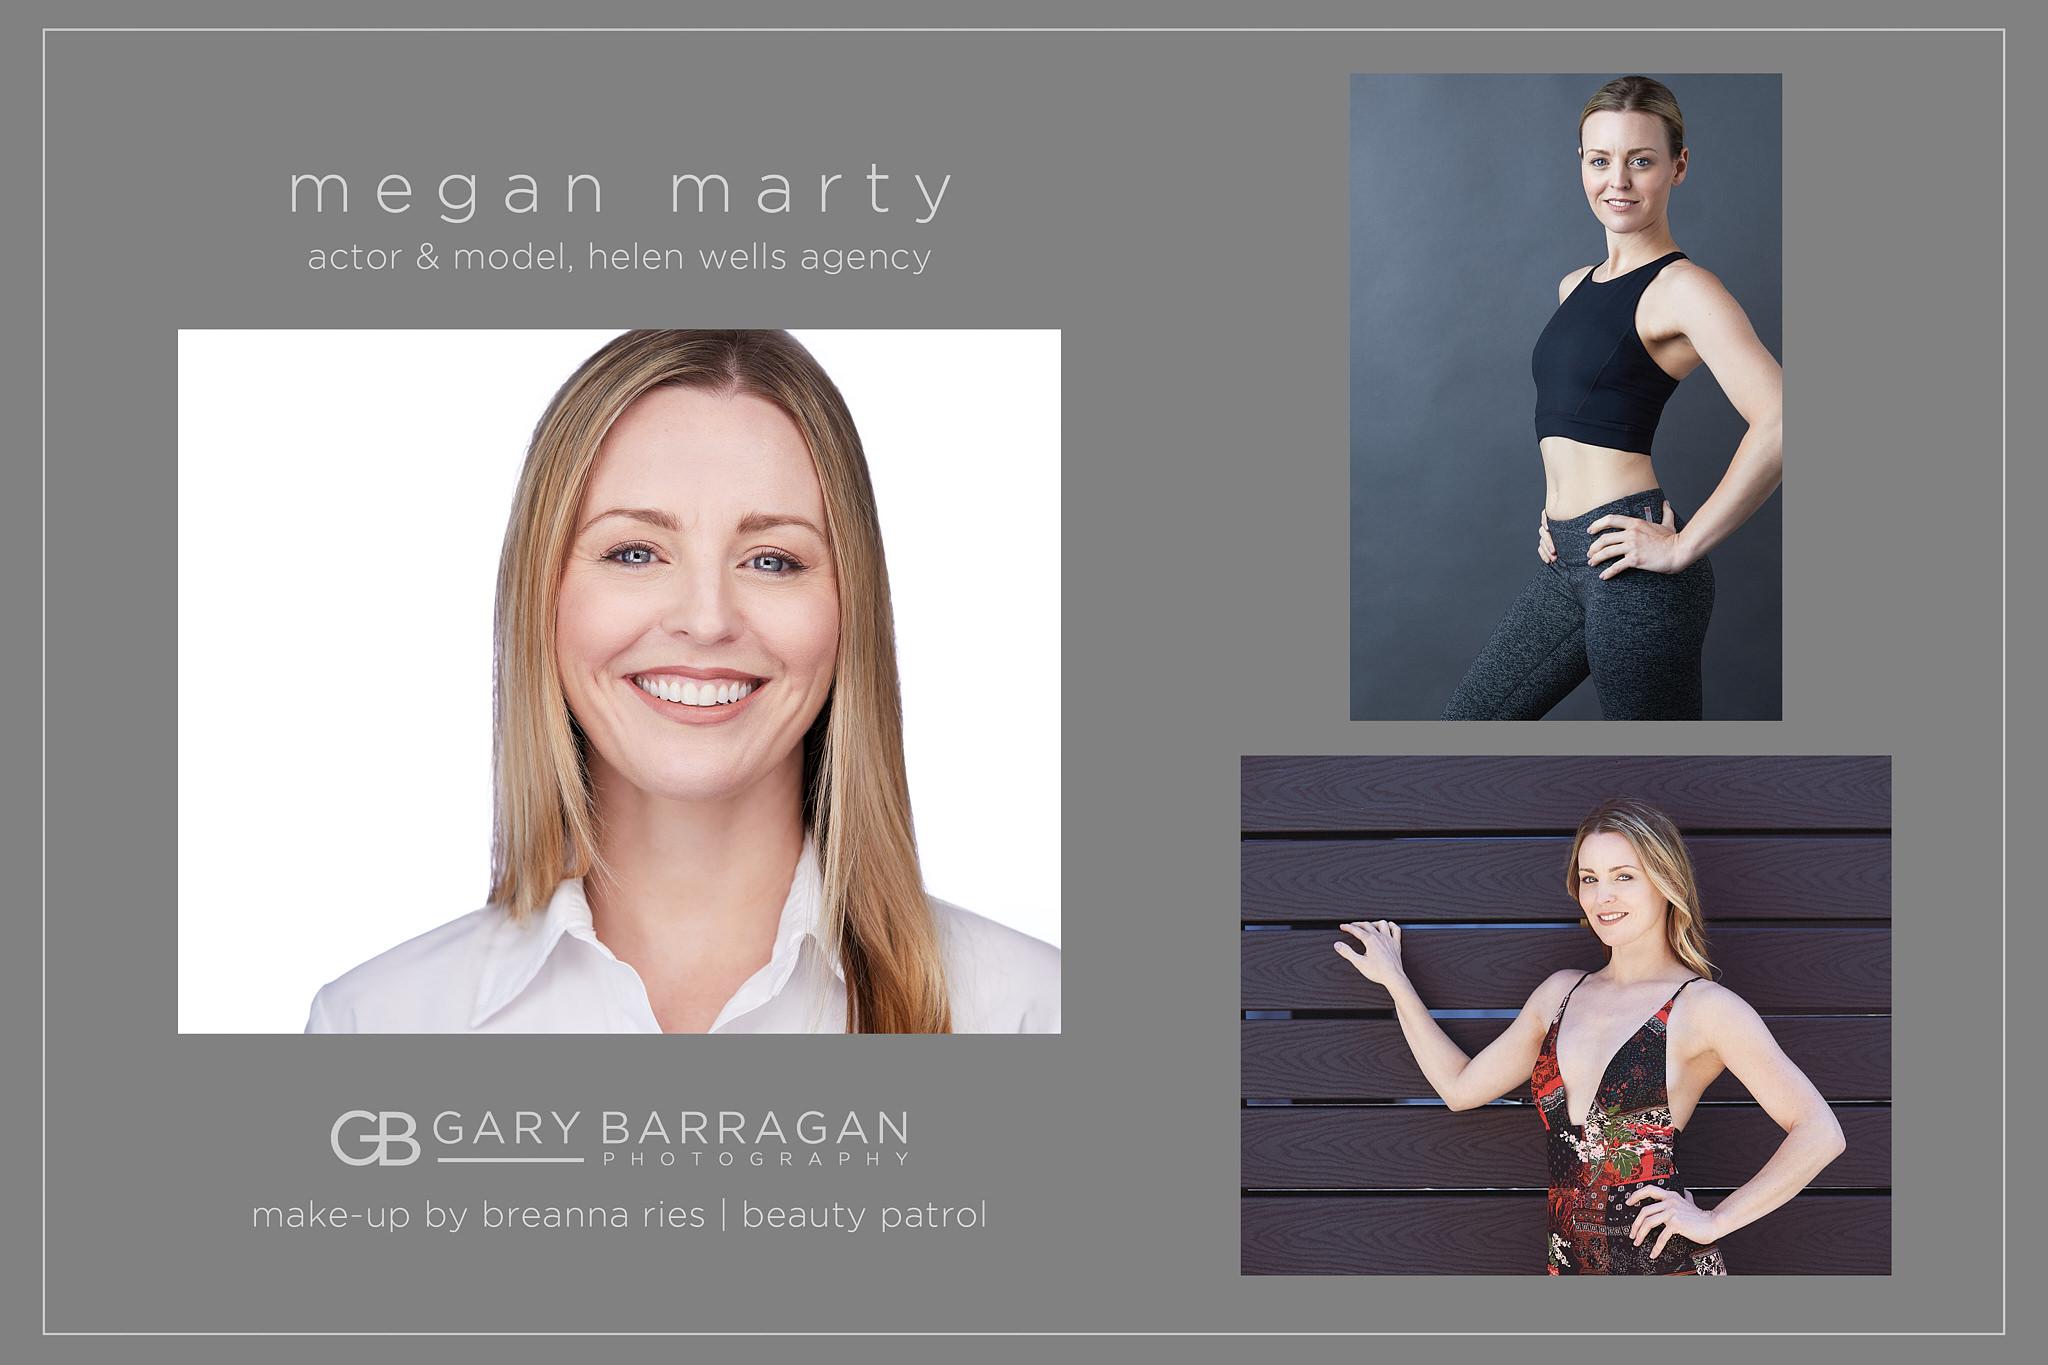 Megan Marty for Helen Wells Agency